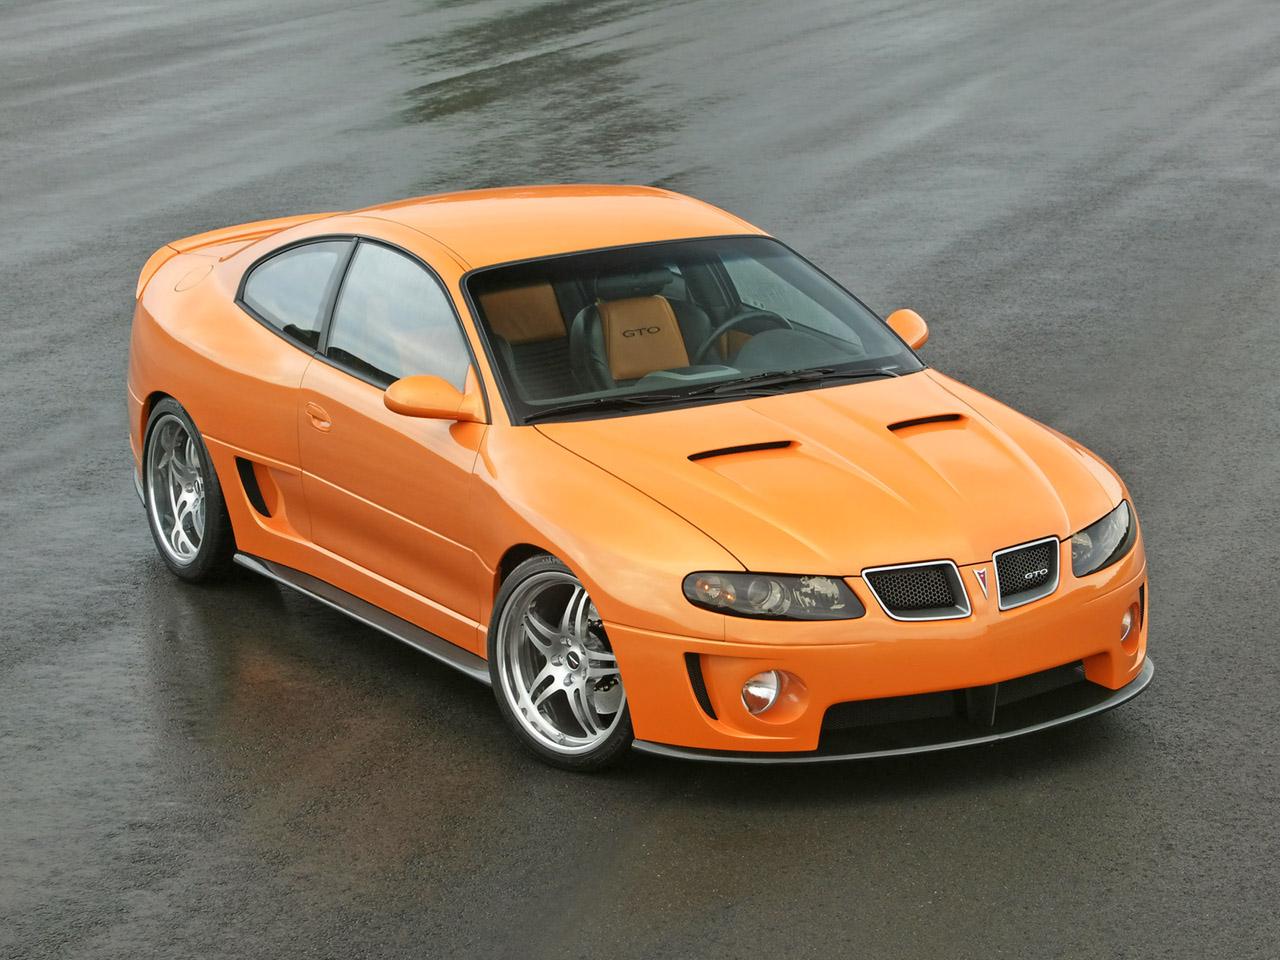 Discontinued Cars - Pontiac GTO